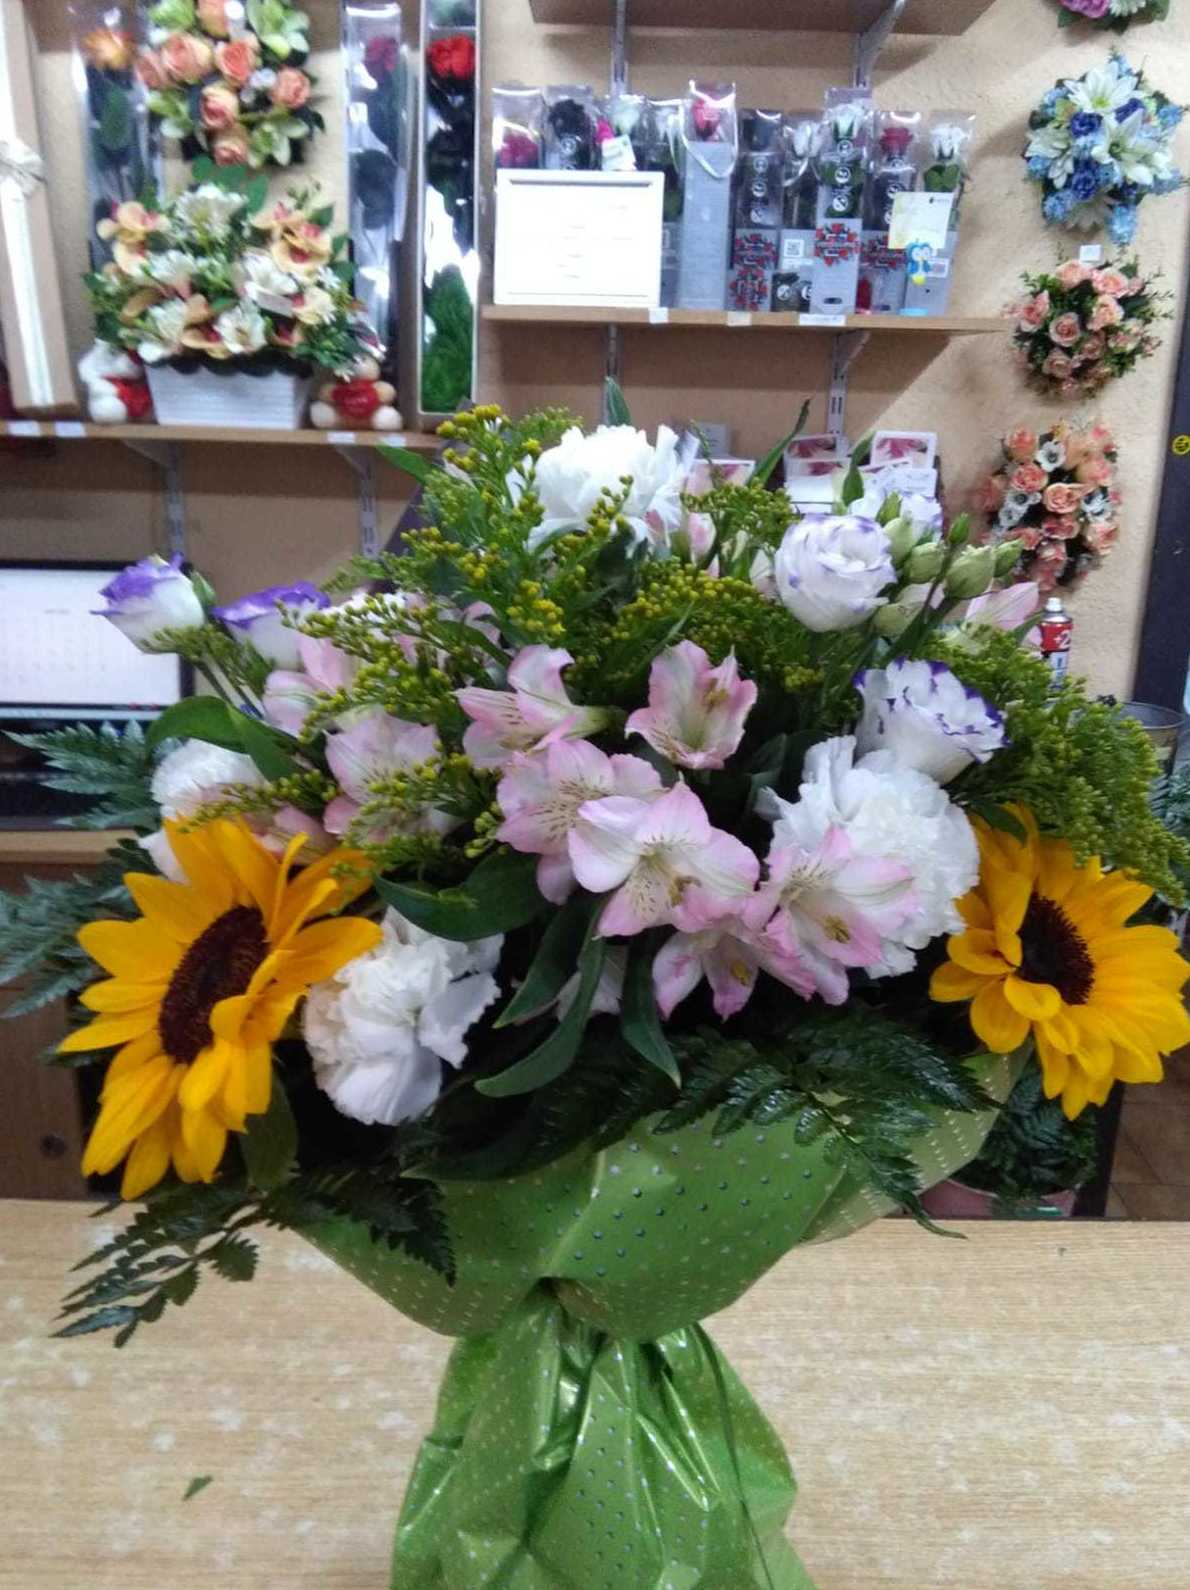 ramo de regalo con girasoles y claveles: CATALOGO de Floristería Manuela